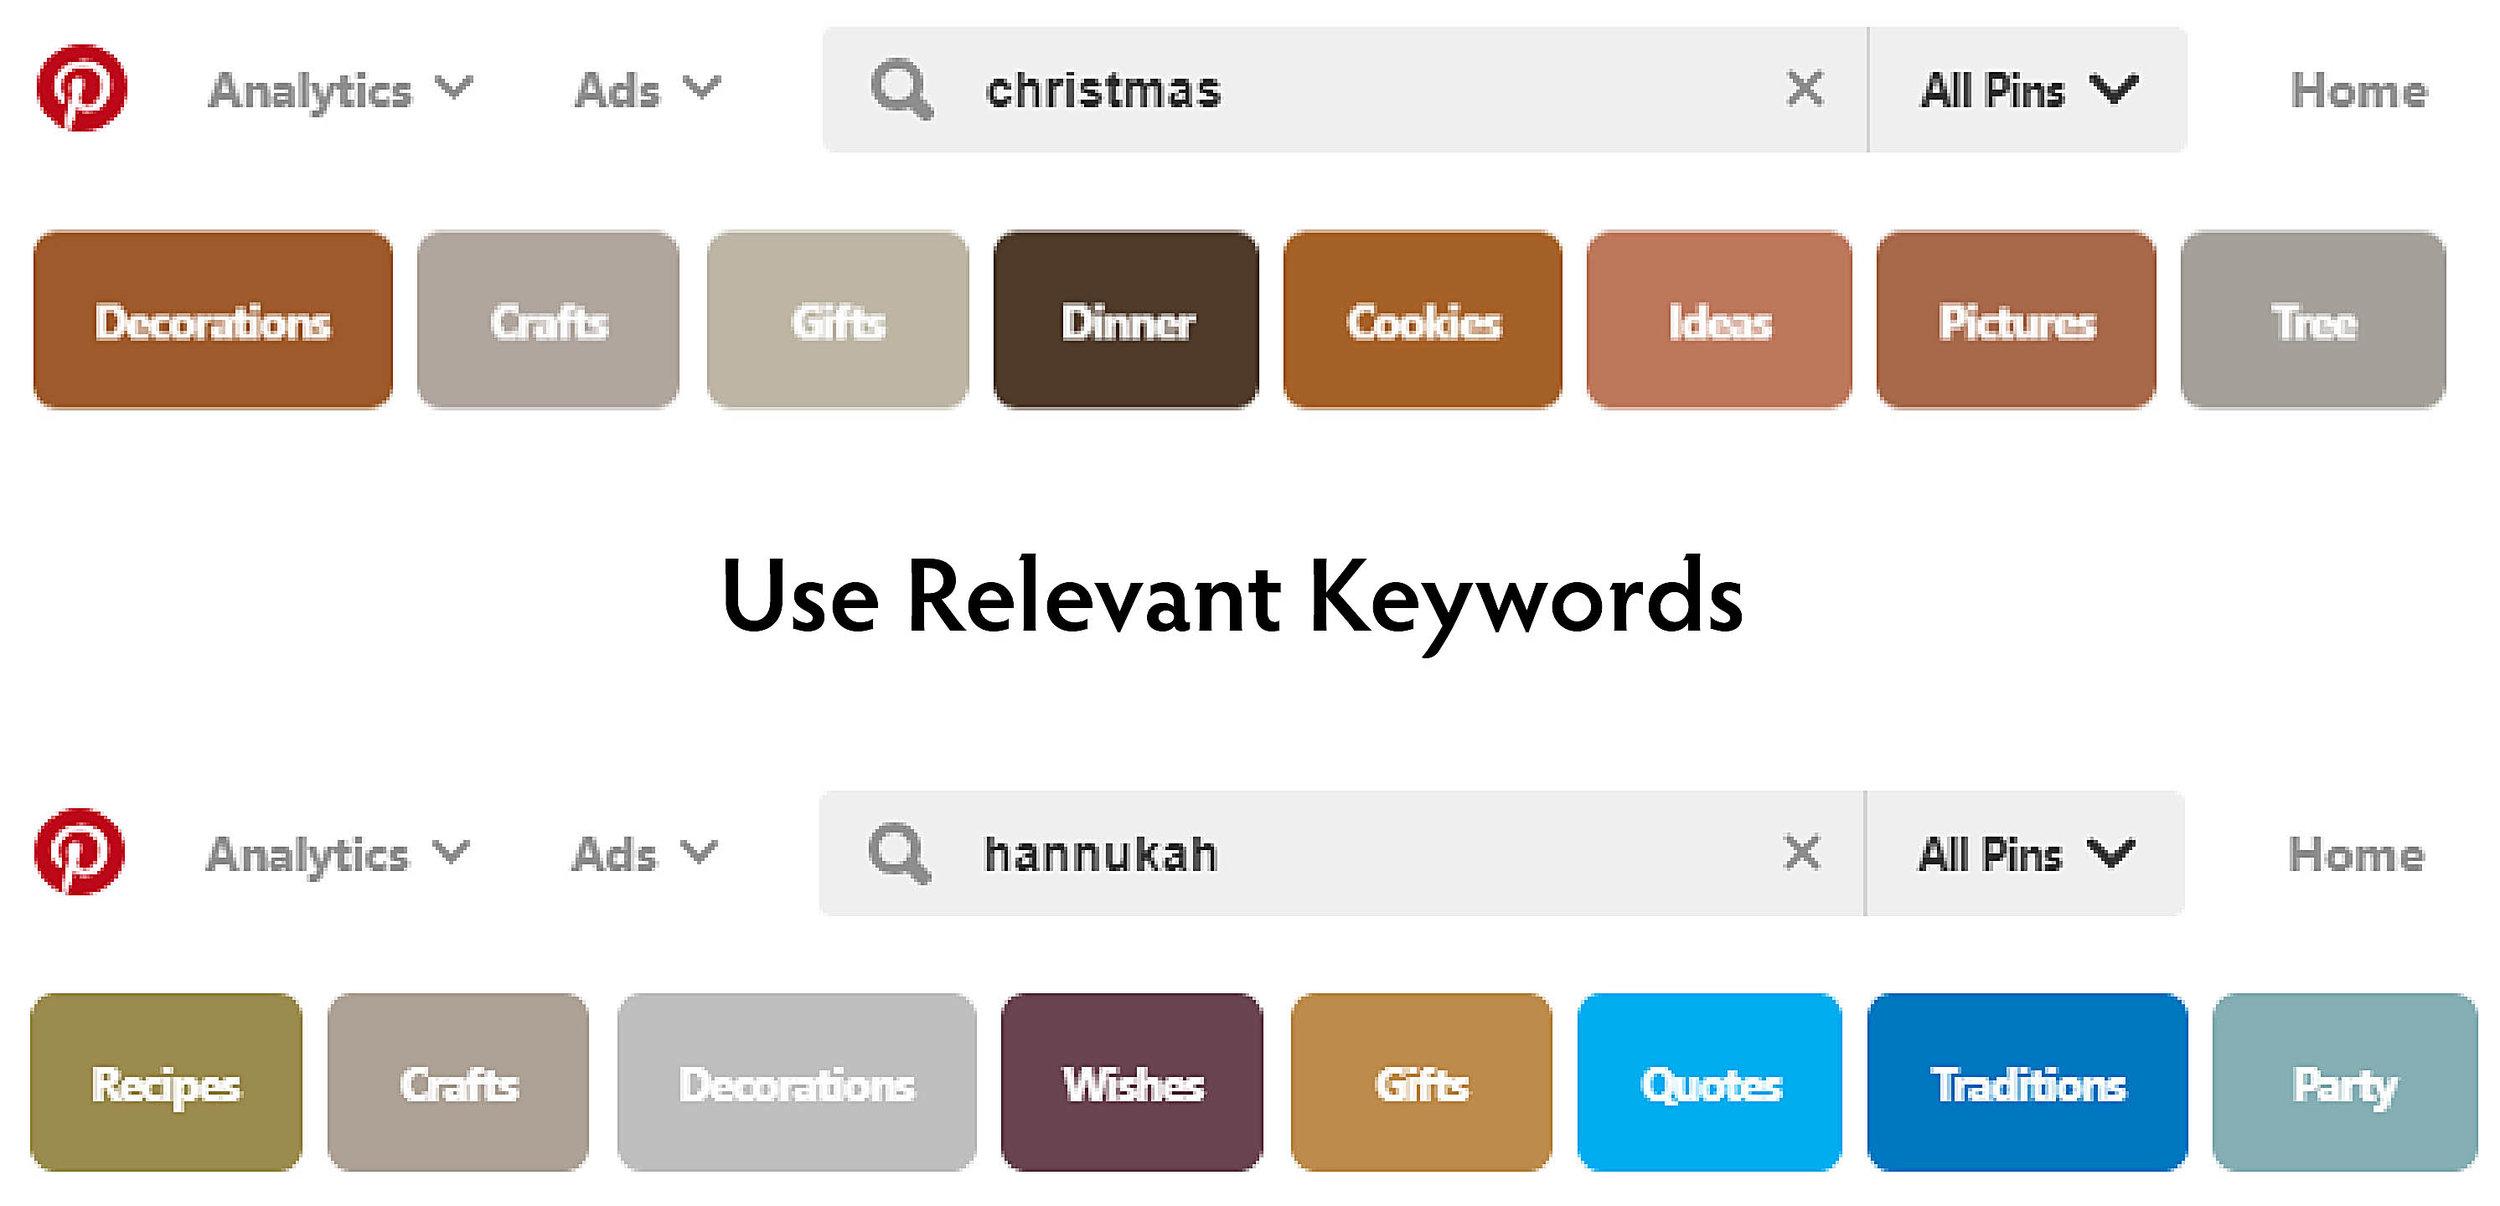 keywords for the holidays.jpg